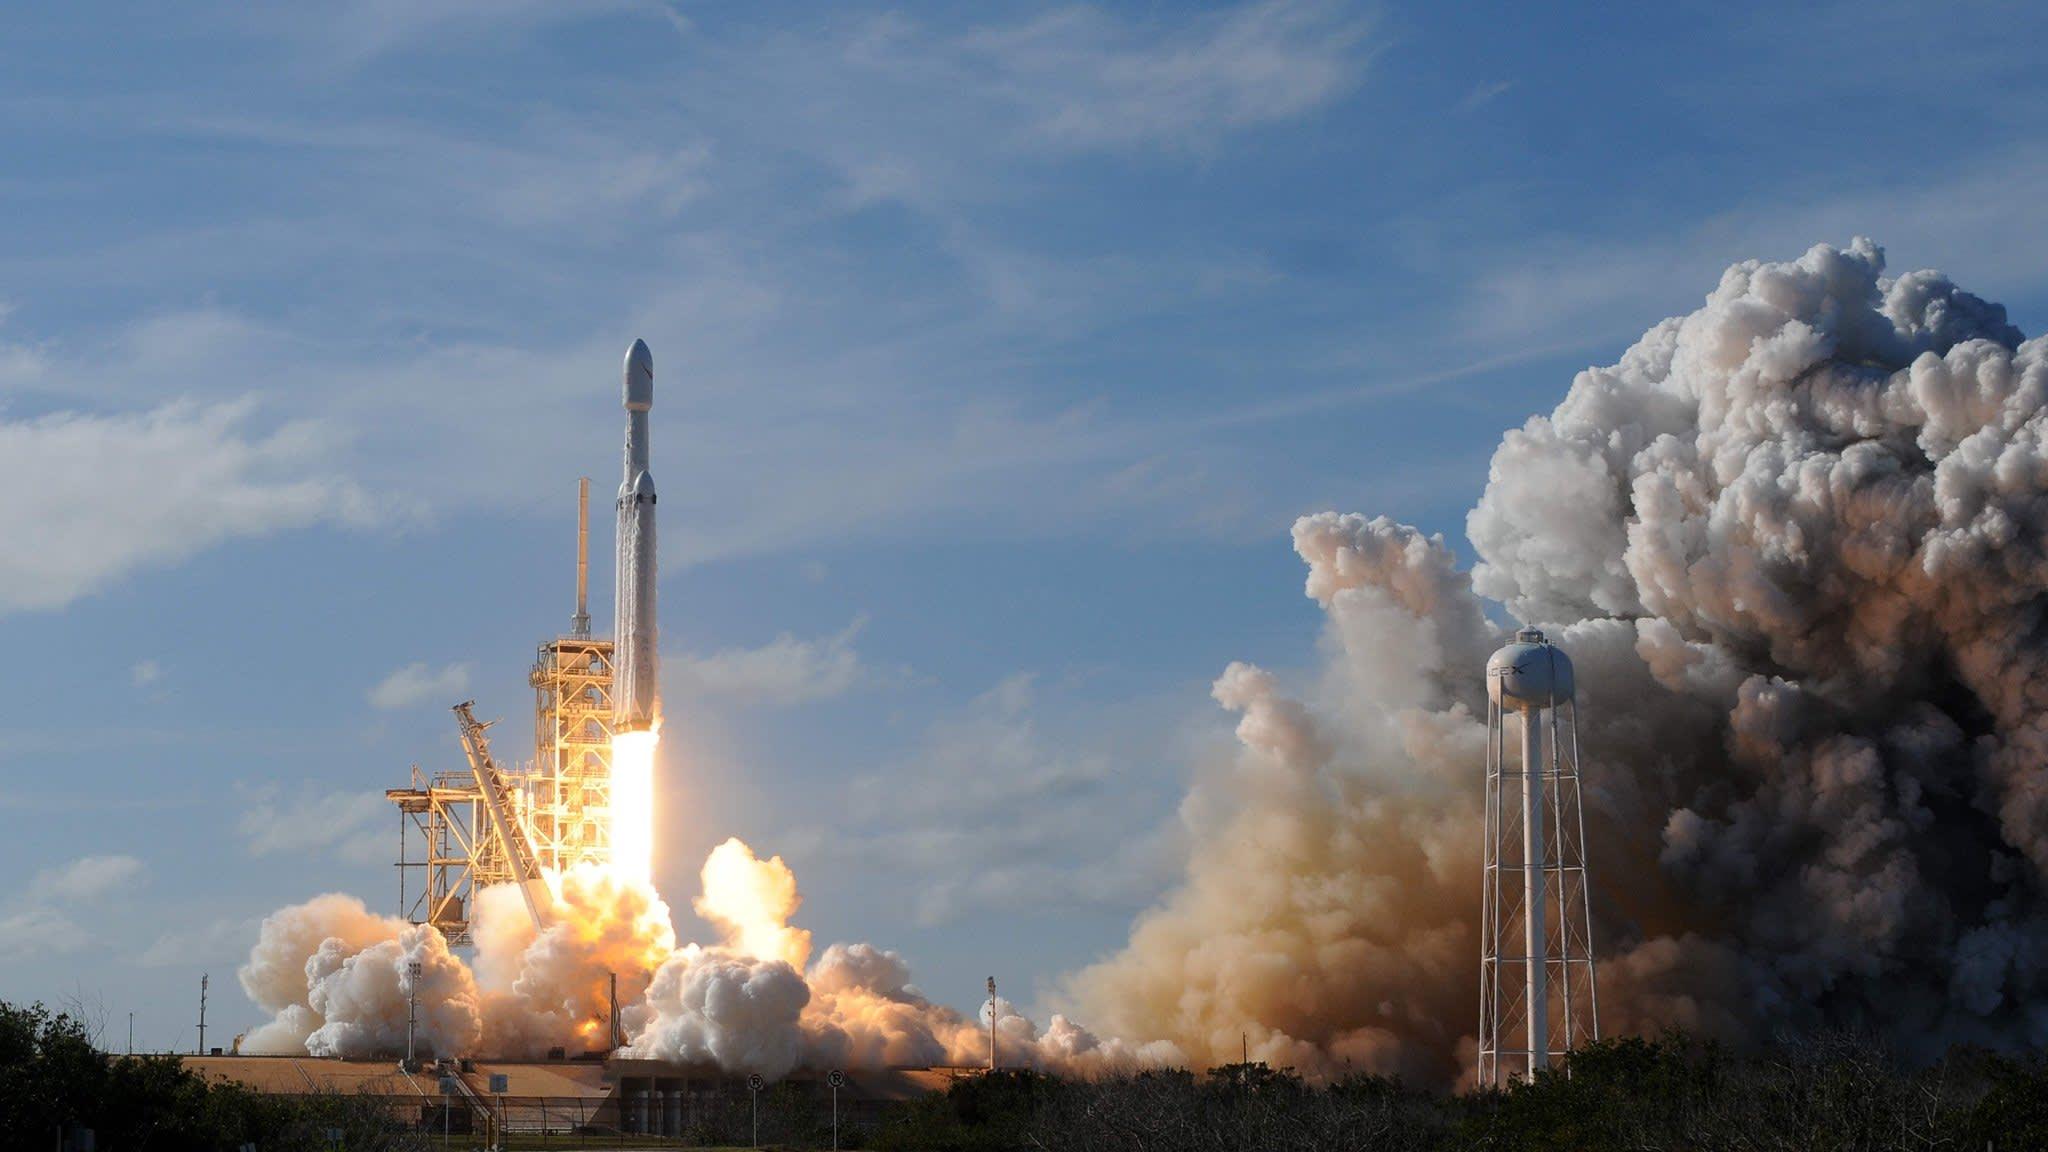 The global technopolitics of space exploration